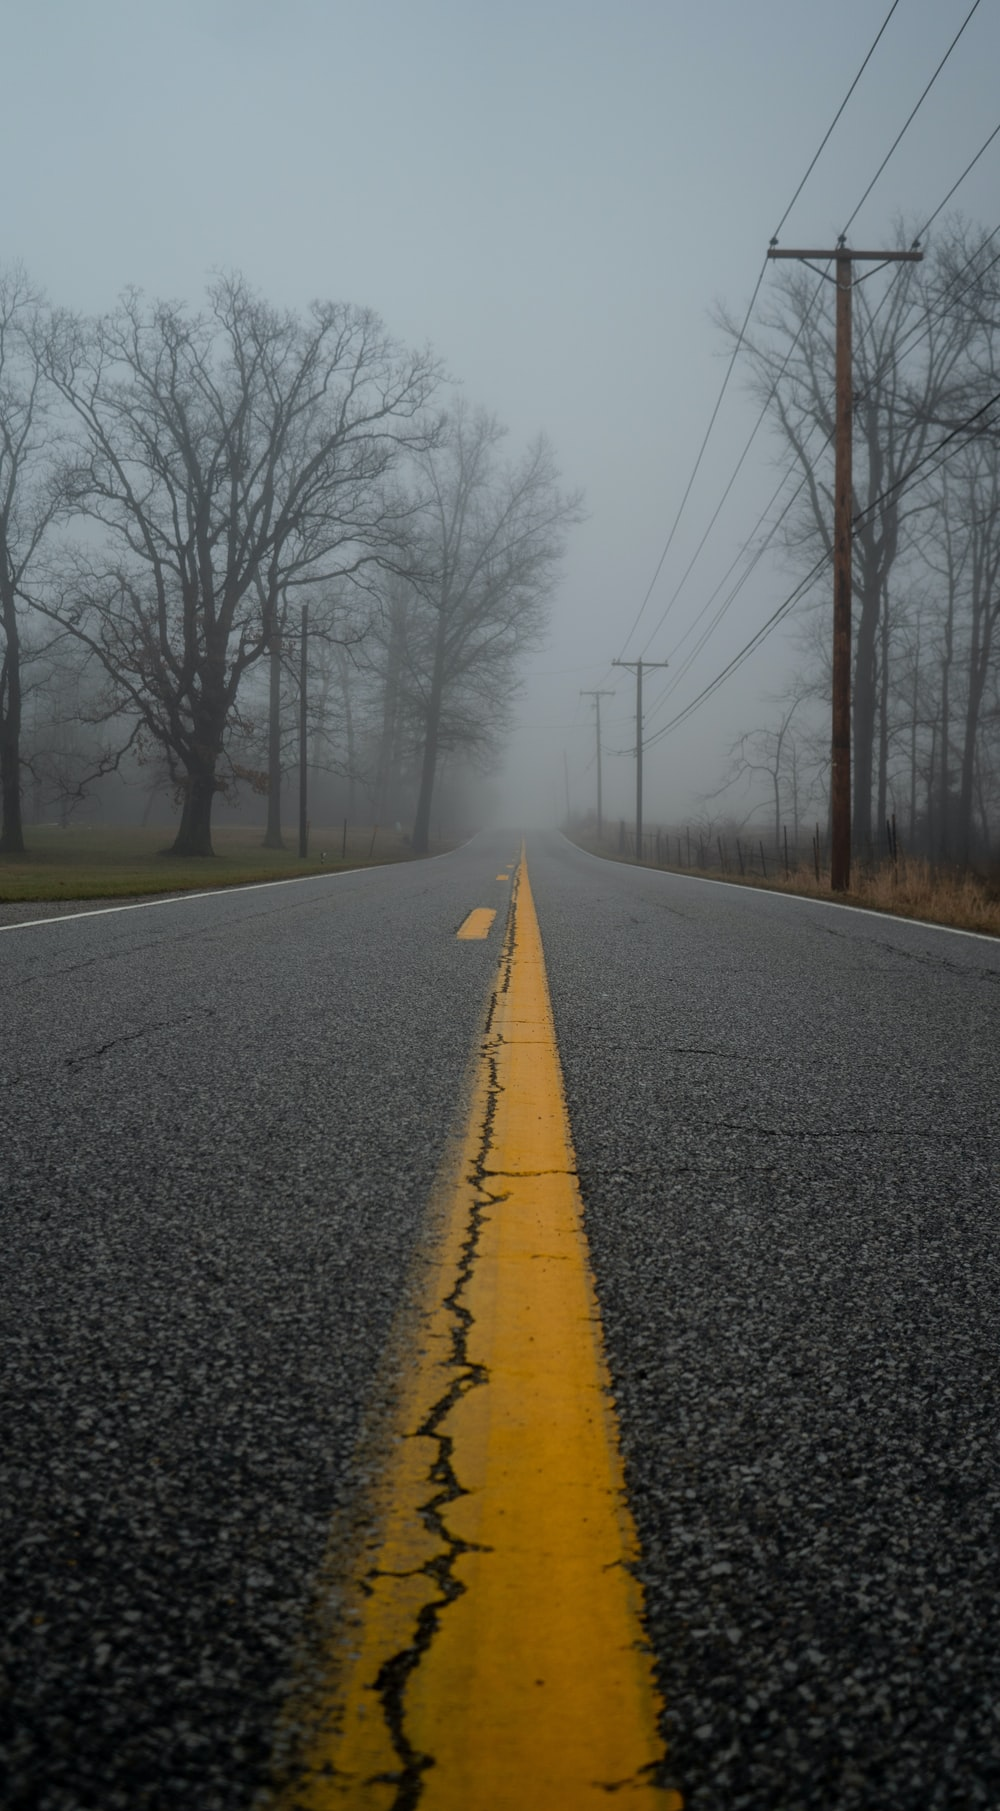 asphalt road between trees during daytime